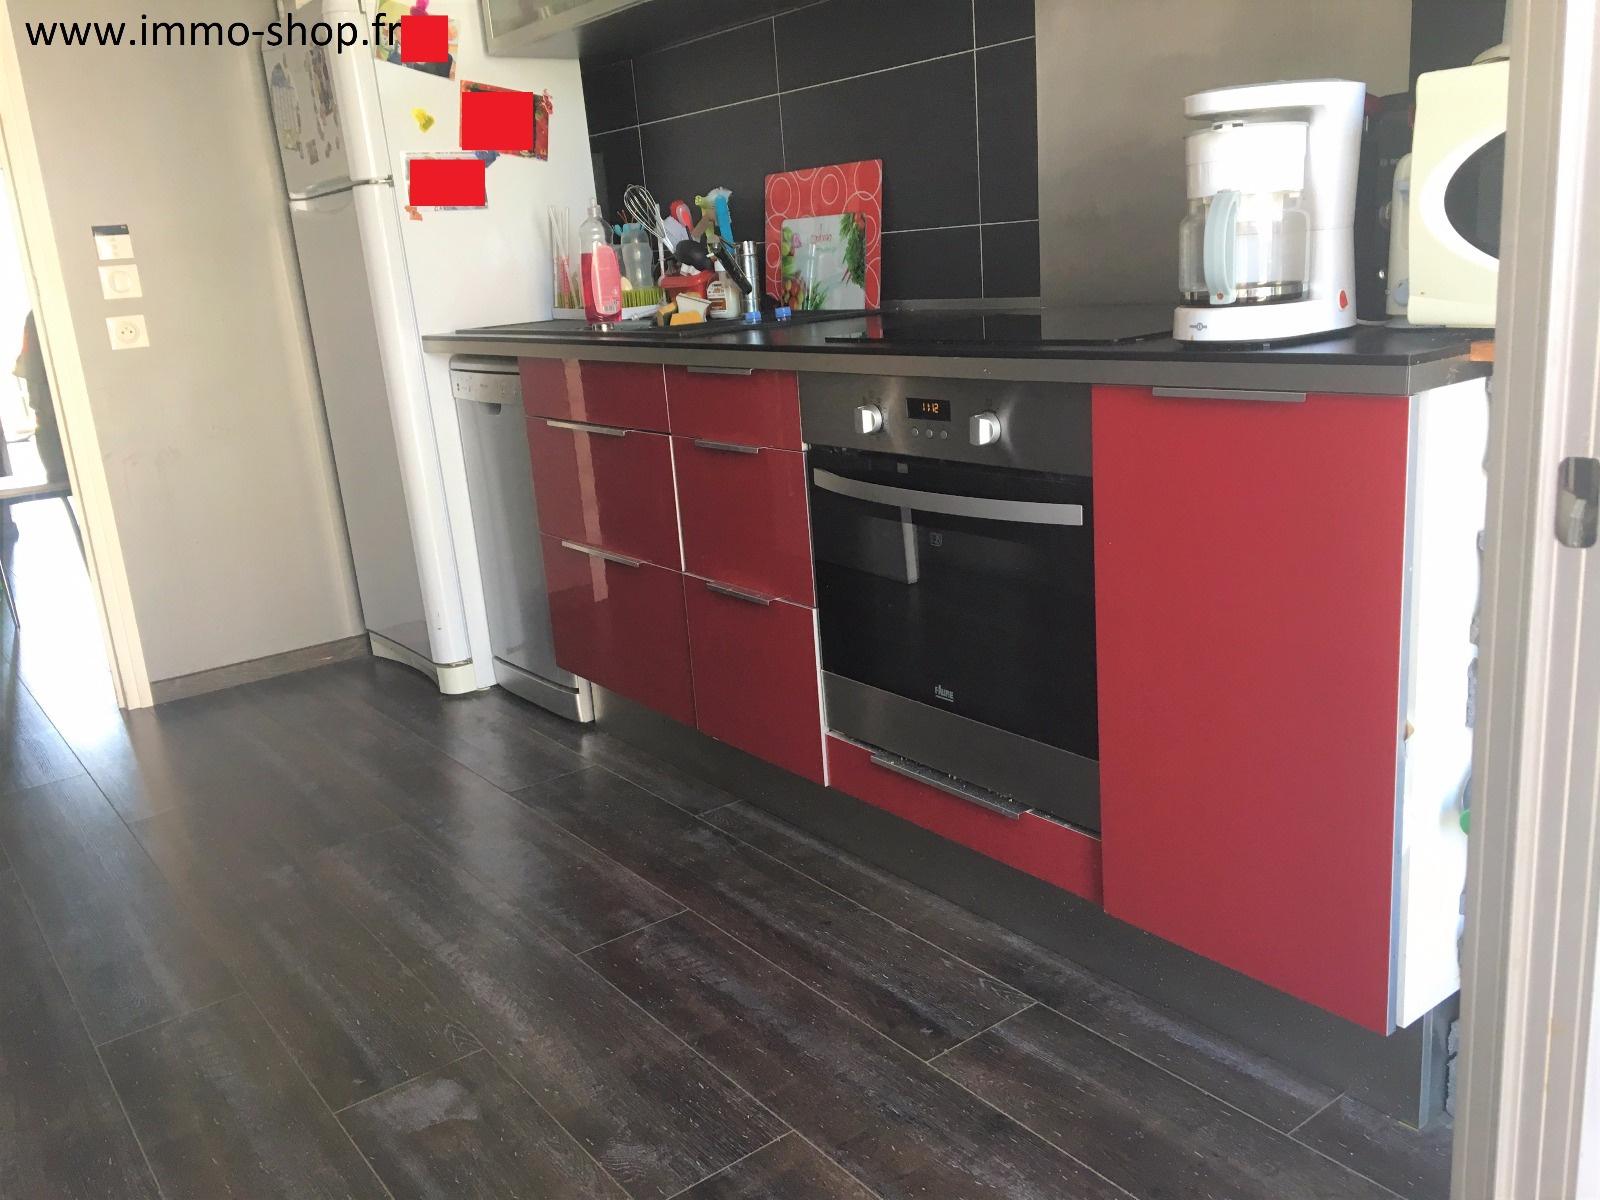 annonce vente appartement m ze 34140 72 m 165 000. Black Bedroom Furniture Sets. Home Design Ideas